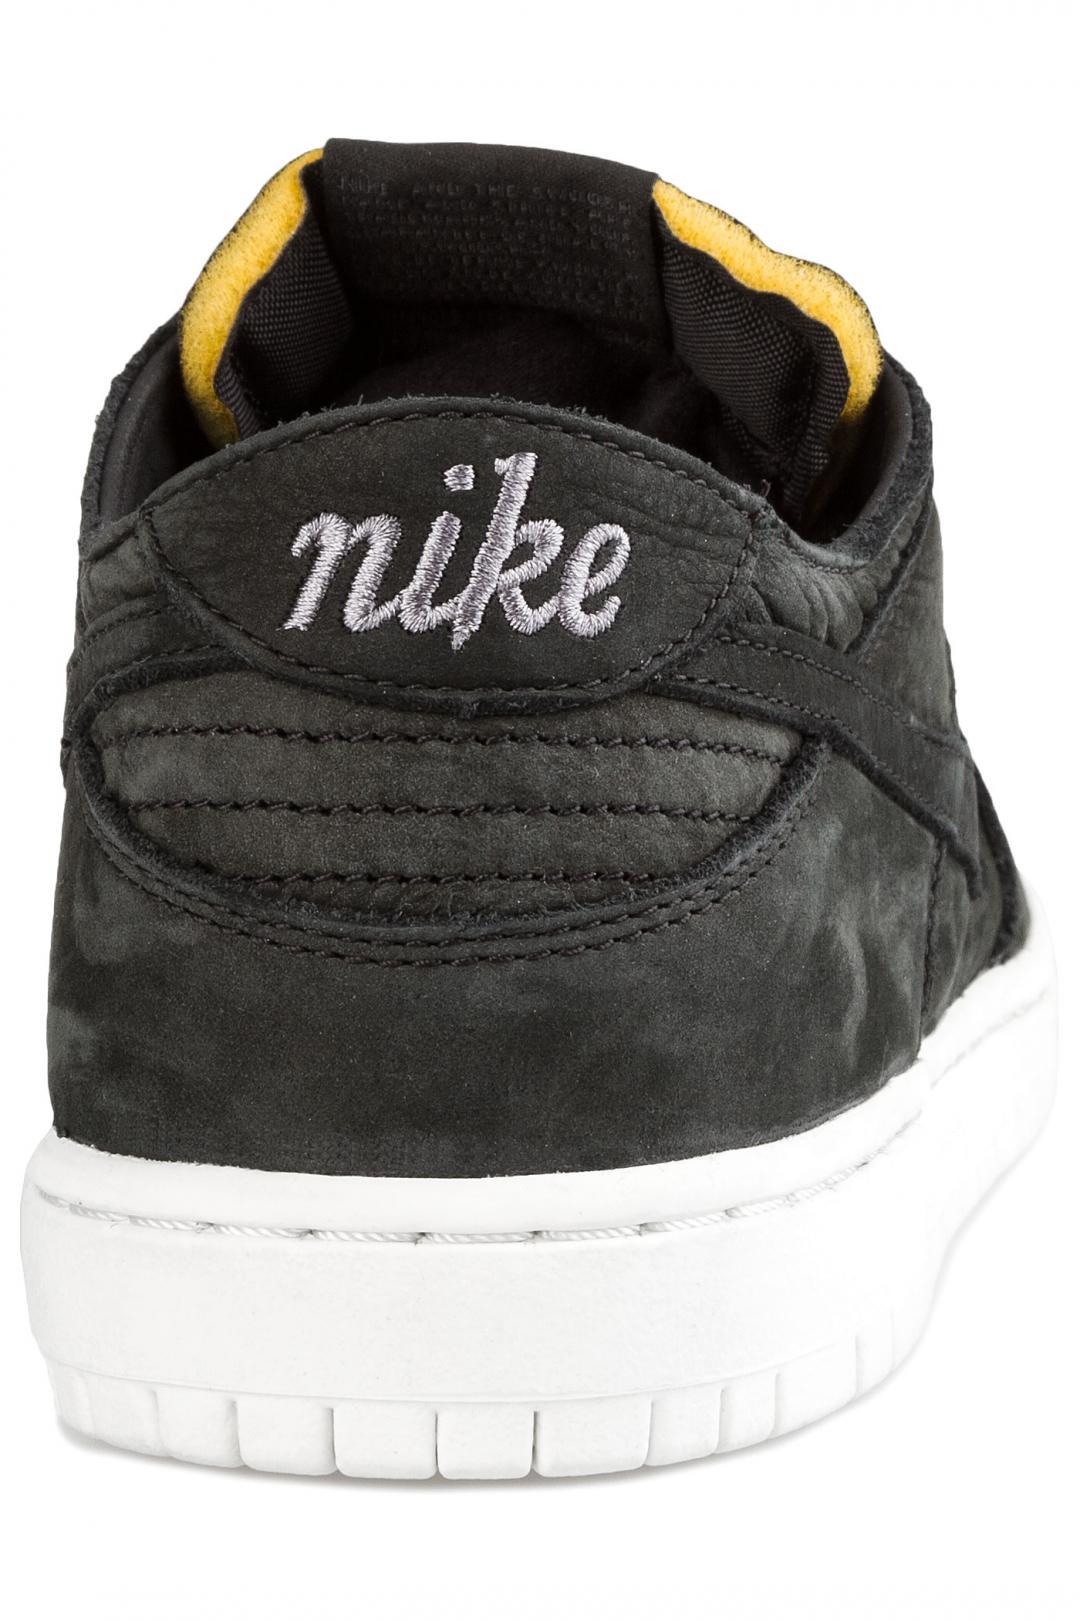 Uomo Nike SB Dunk Low Pro Deconstructed black summit white anthracite | Scarpe da skate